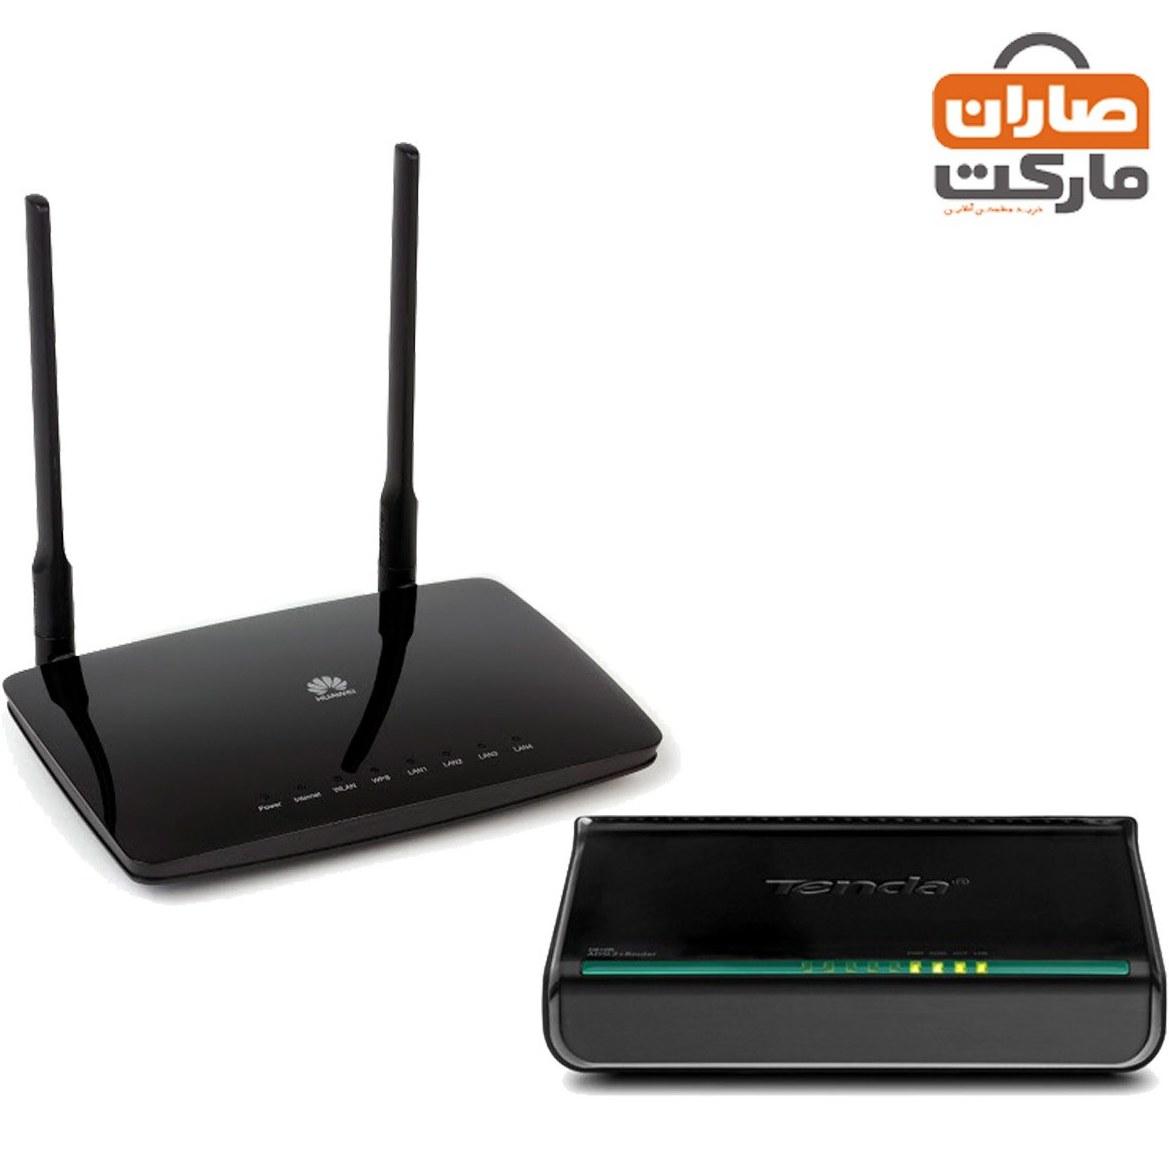 تصویر باندل مودم ADSL کابلی Tenda و روتر بیسیم Huawei ا باندل مودم ADSL کابلی Tenda و روتر بیسیم Huawei باندل مودم ADSL کابلی Tenda و روتر بیسیم Huawei